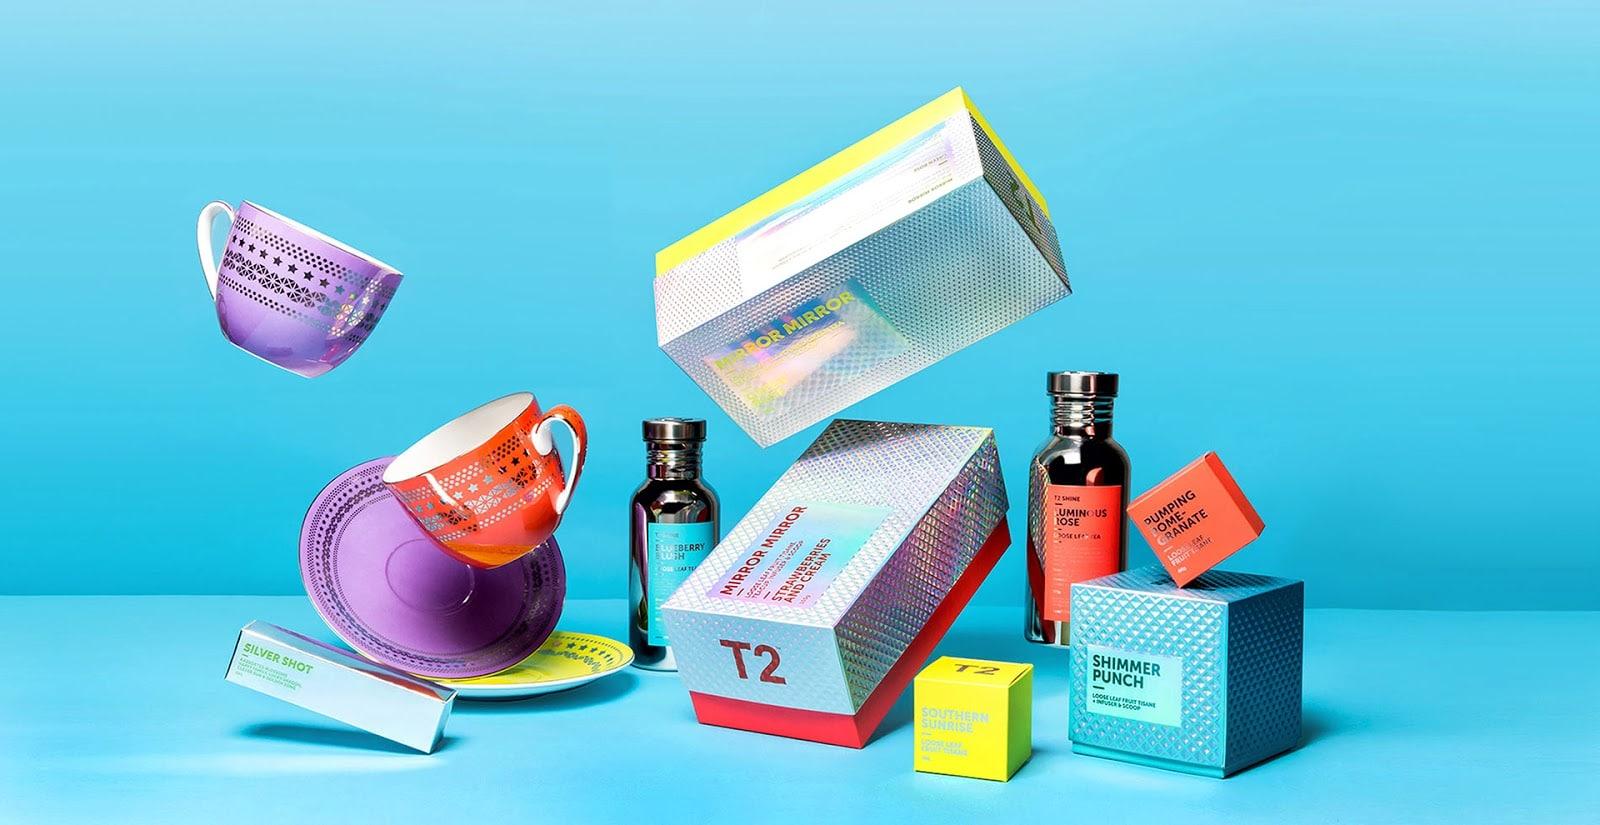 T2-Tea-corporate-gift